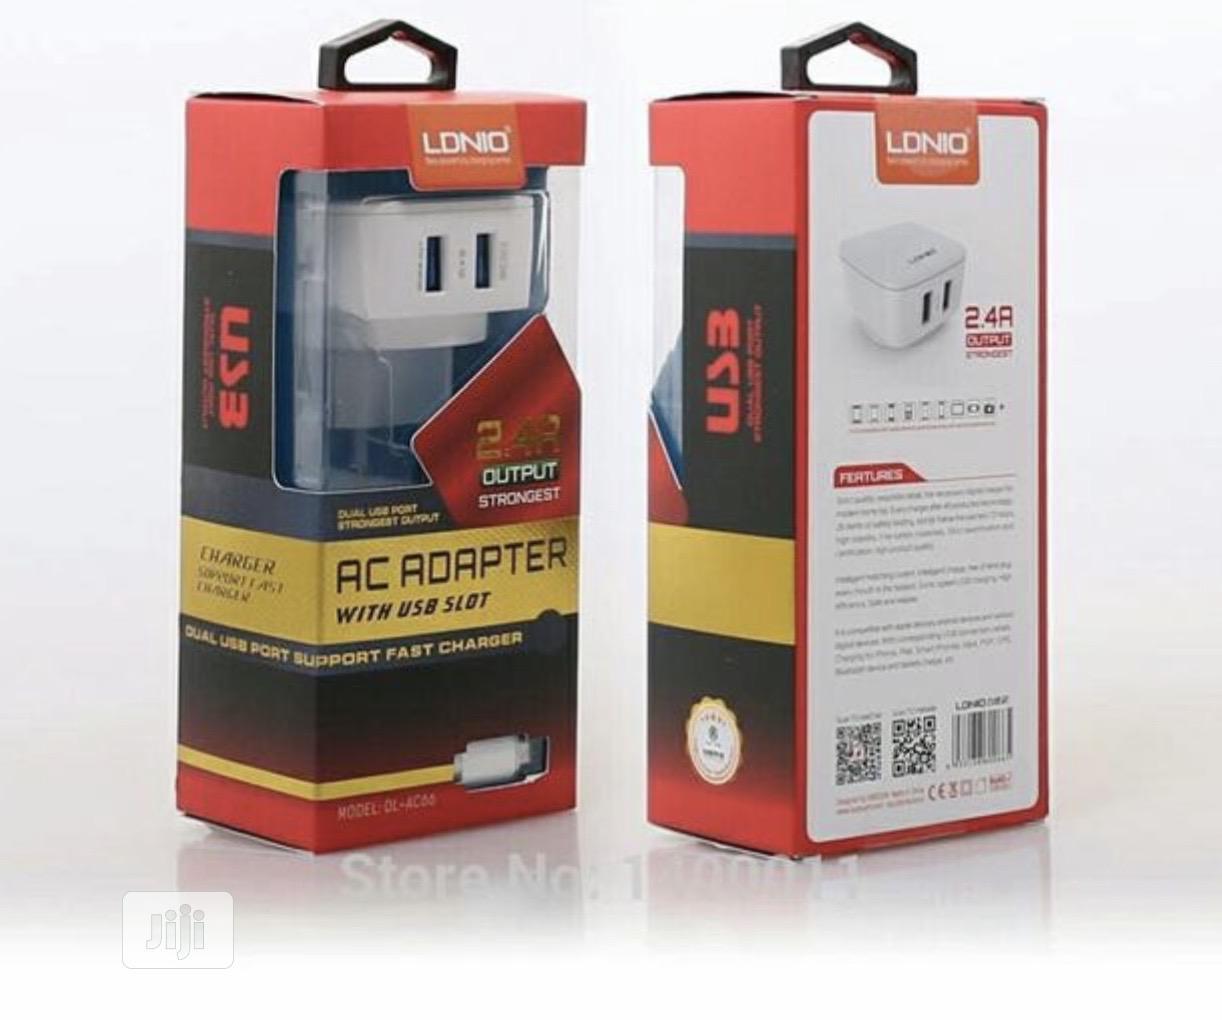 LDNIO 5V 2.4A Travel Dual 2 USB Charger